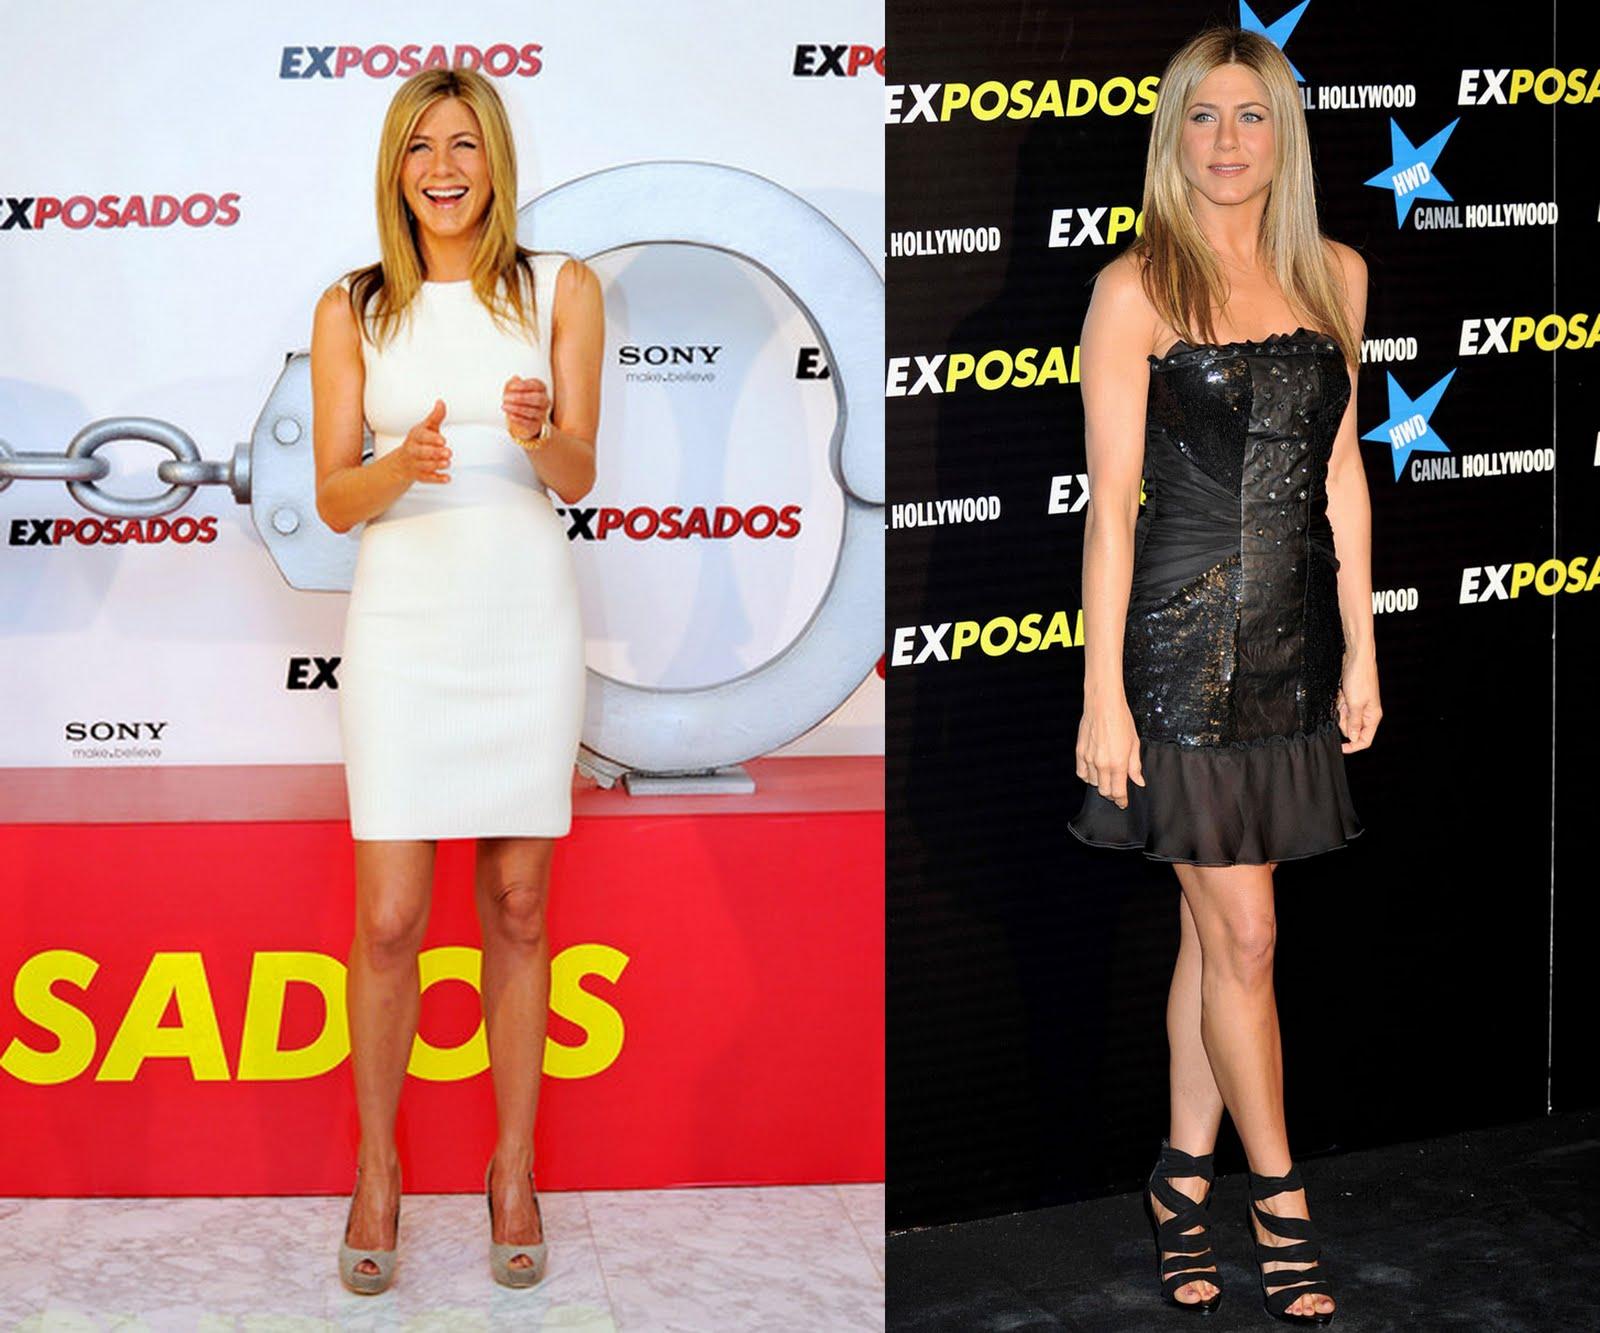 http://1.bp.blogspot.com/_Jv8ysS5aZGA/S7jD2wfjuCI/AAAAAAAALD8/ZNCXupxdHhQ/s1600/The%2BBounty%2BHunter%2BJennifer%2BAniston%2B-Madrid.jpg